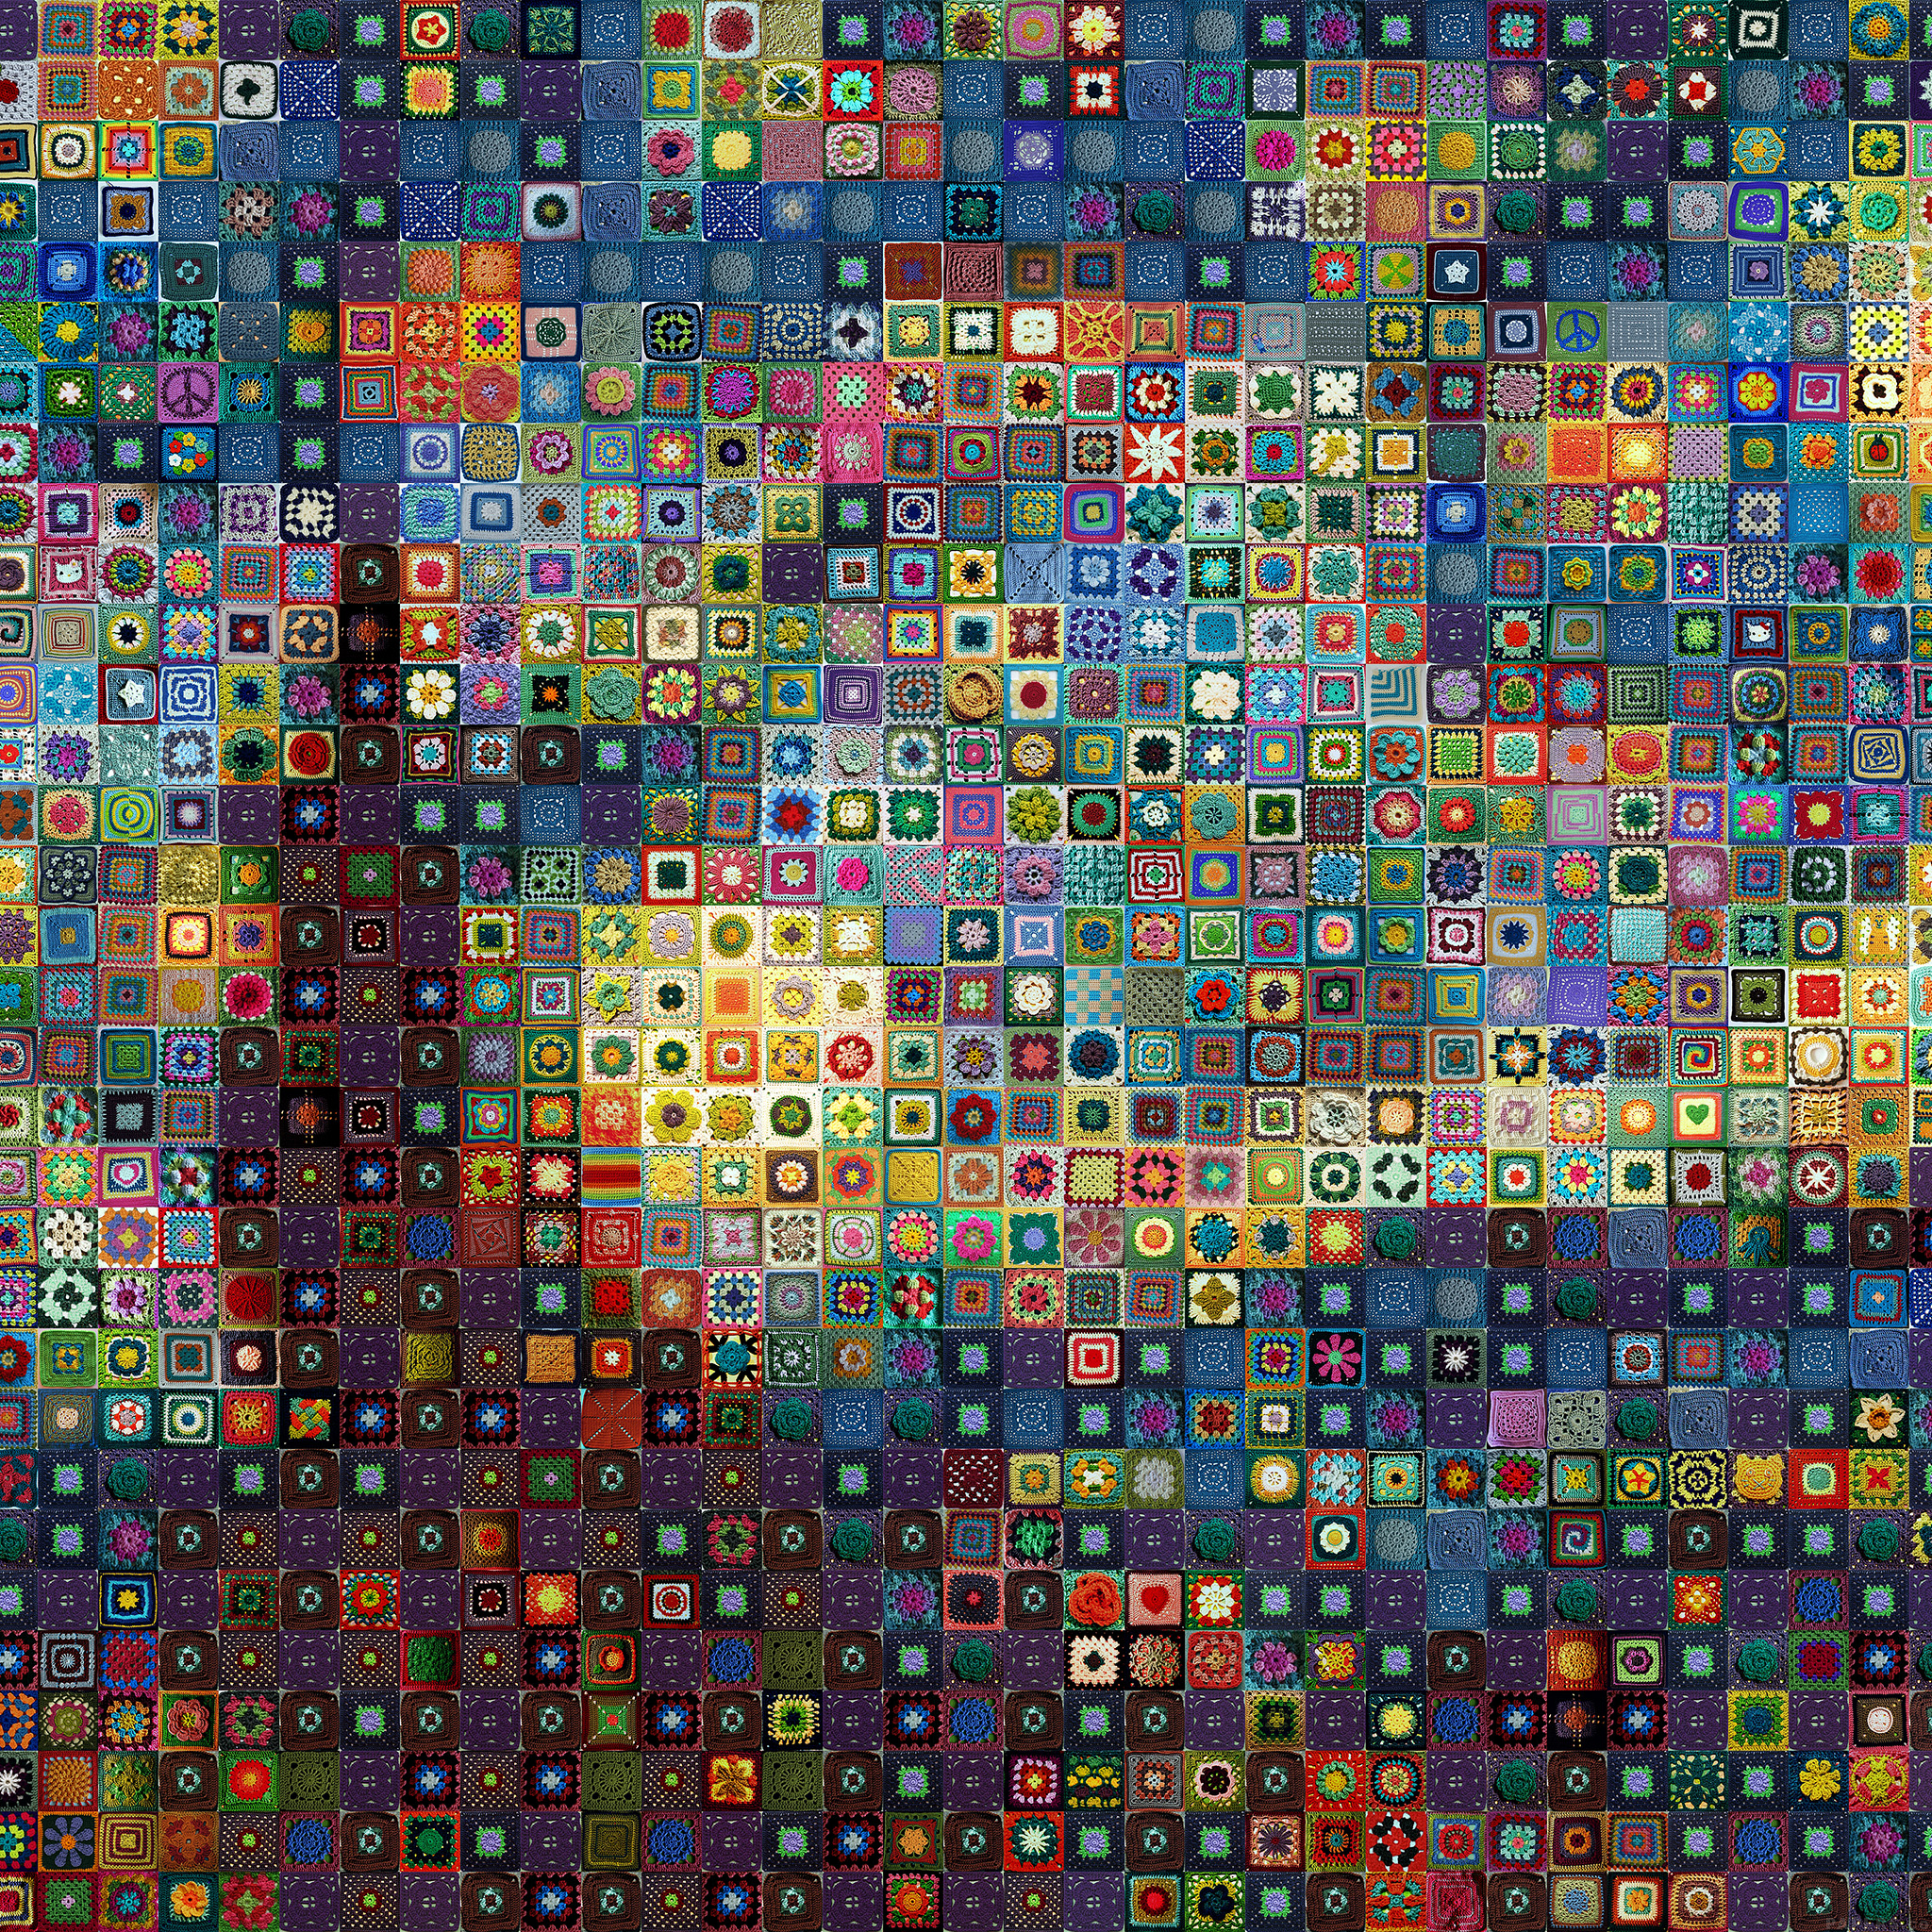 Van Gogh Wallpaper: WALLPAPERS